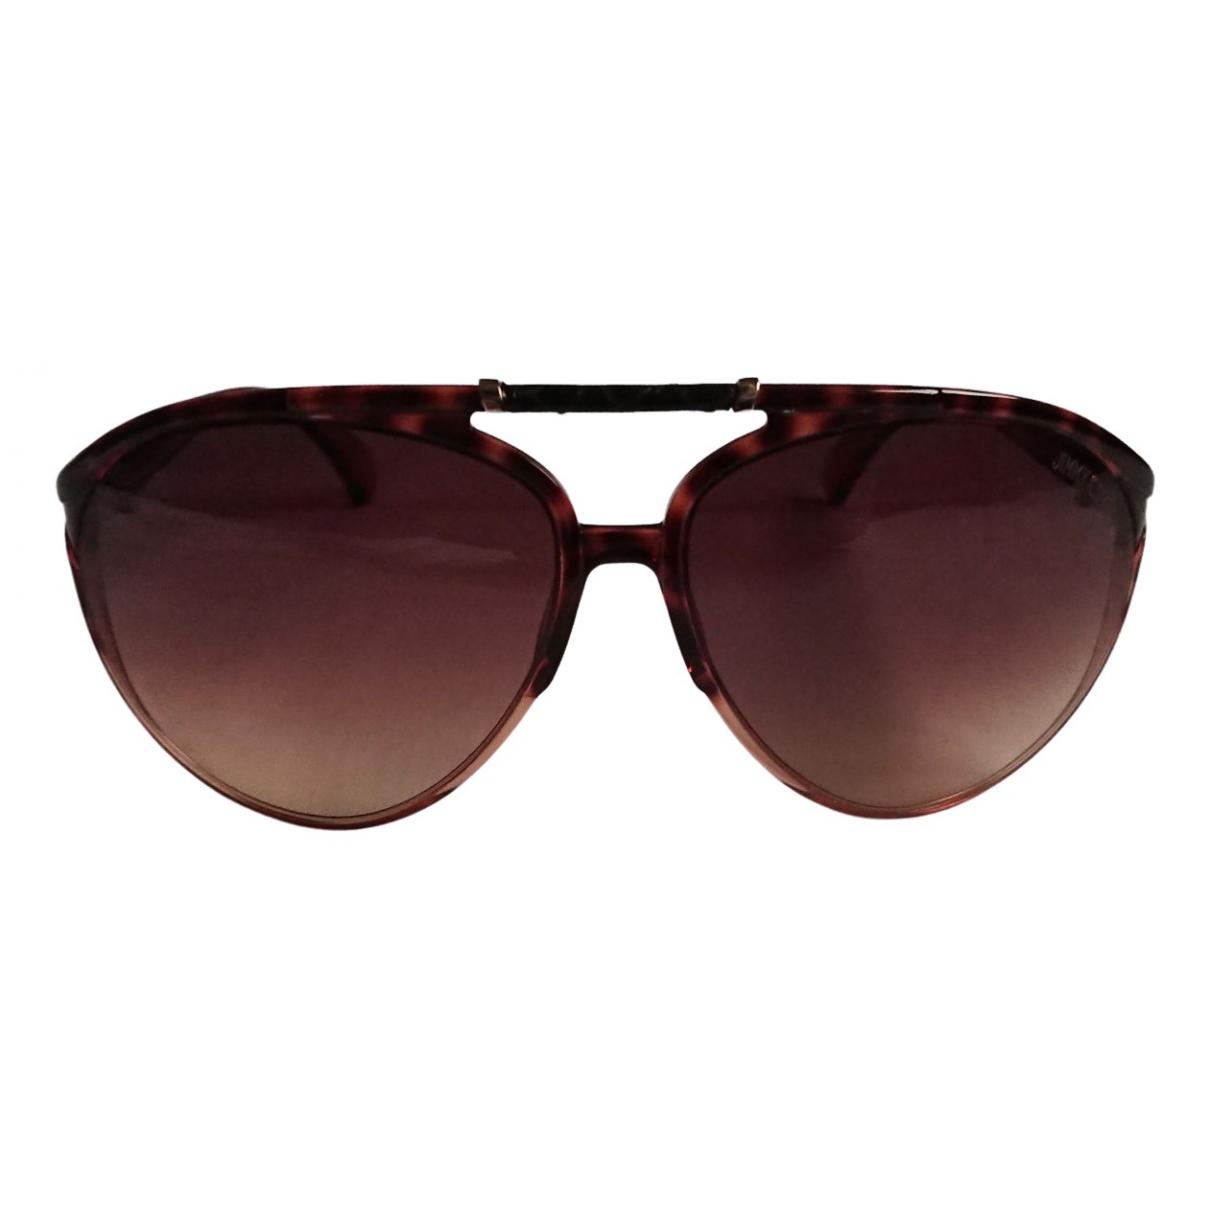 Jimmy Choo N Brown Sunglasses for Women N